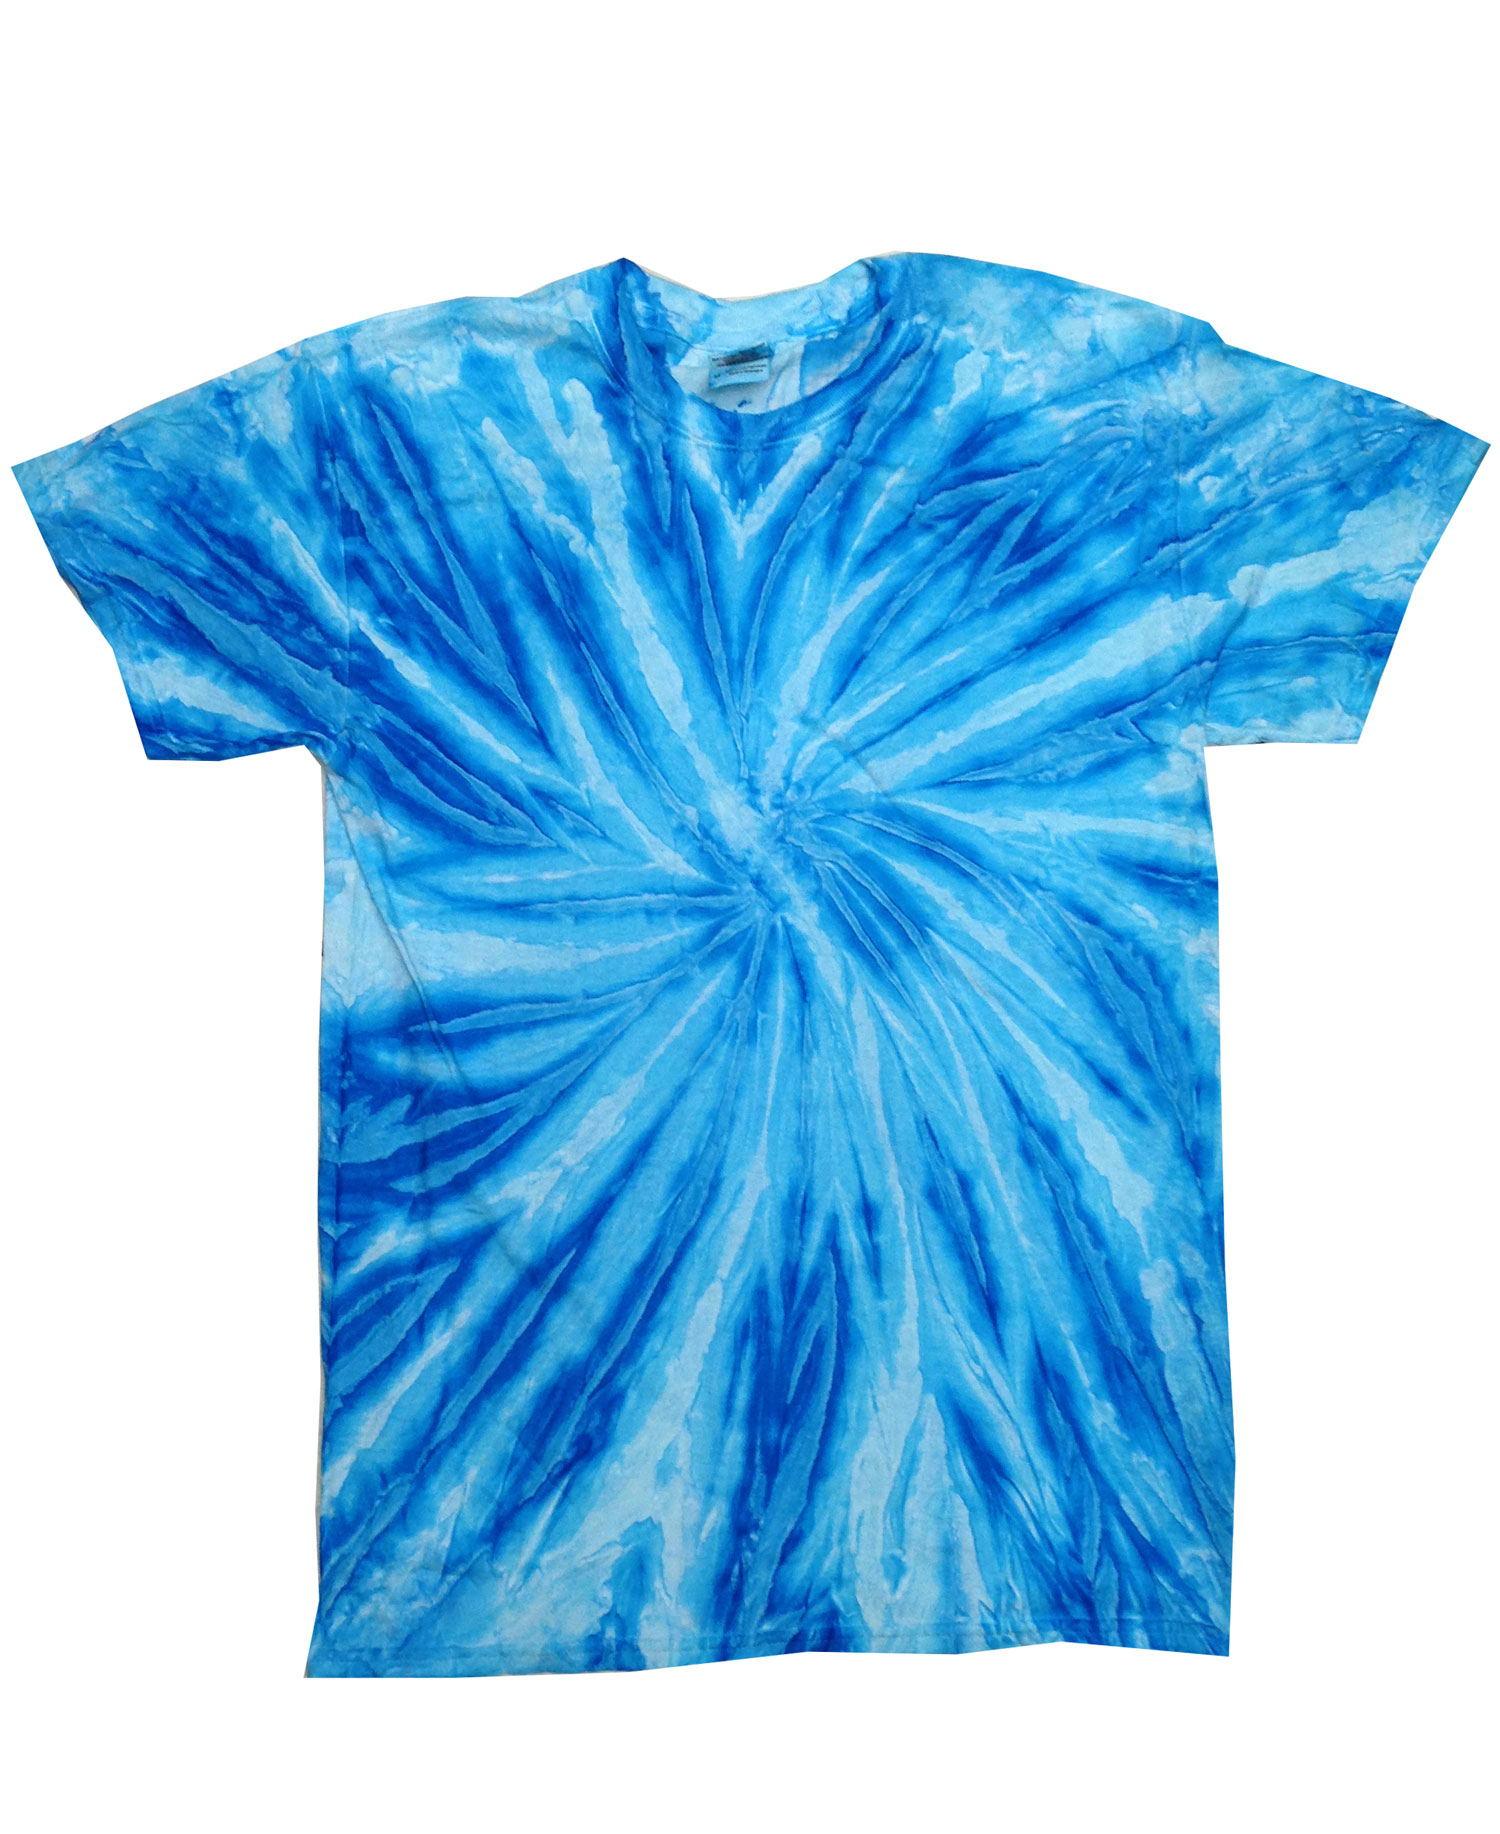 Colortone - T980P Yth Neon Twist Tie Dye